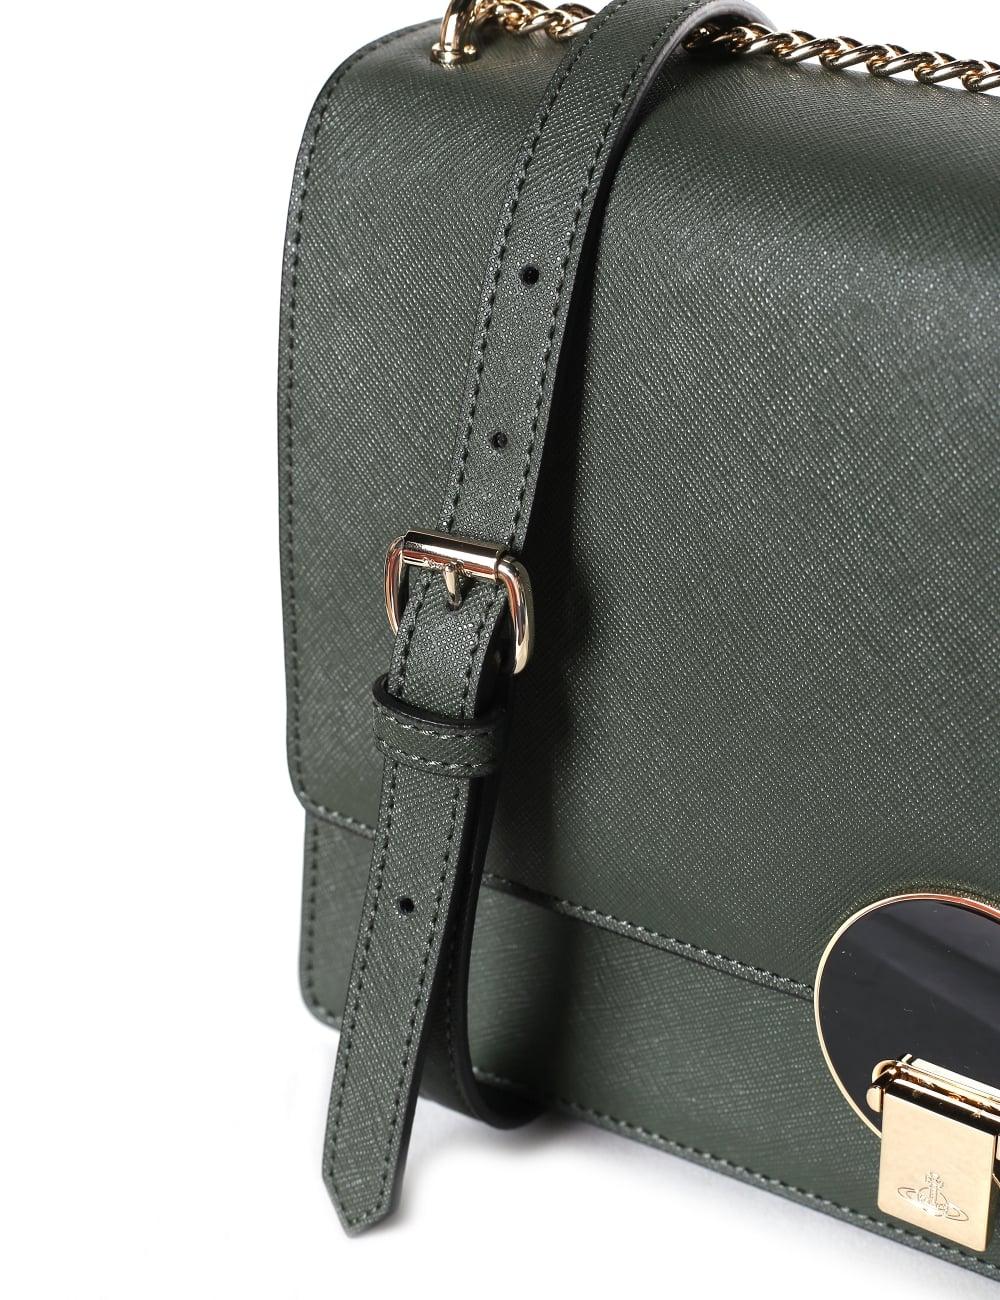 16085cc71 Vivienne Westwood Opio Saffiano Women's Large Crossbody Bag